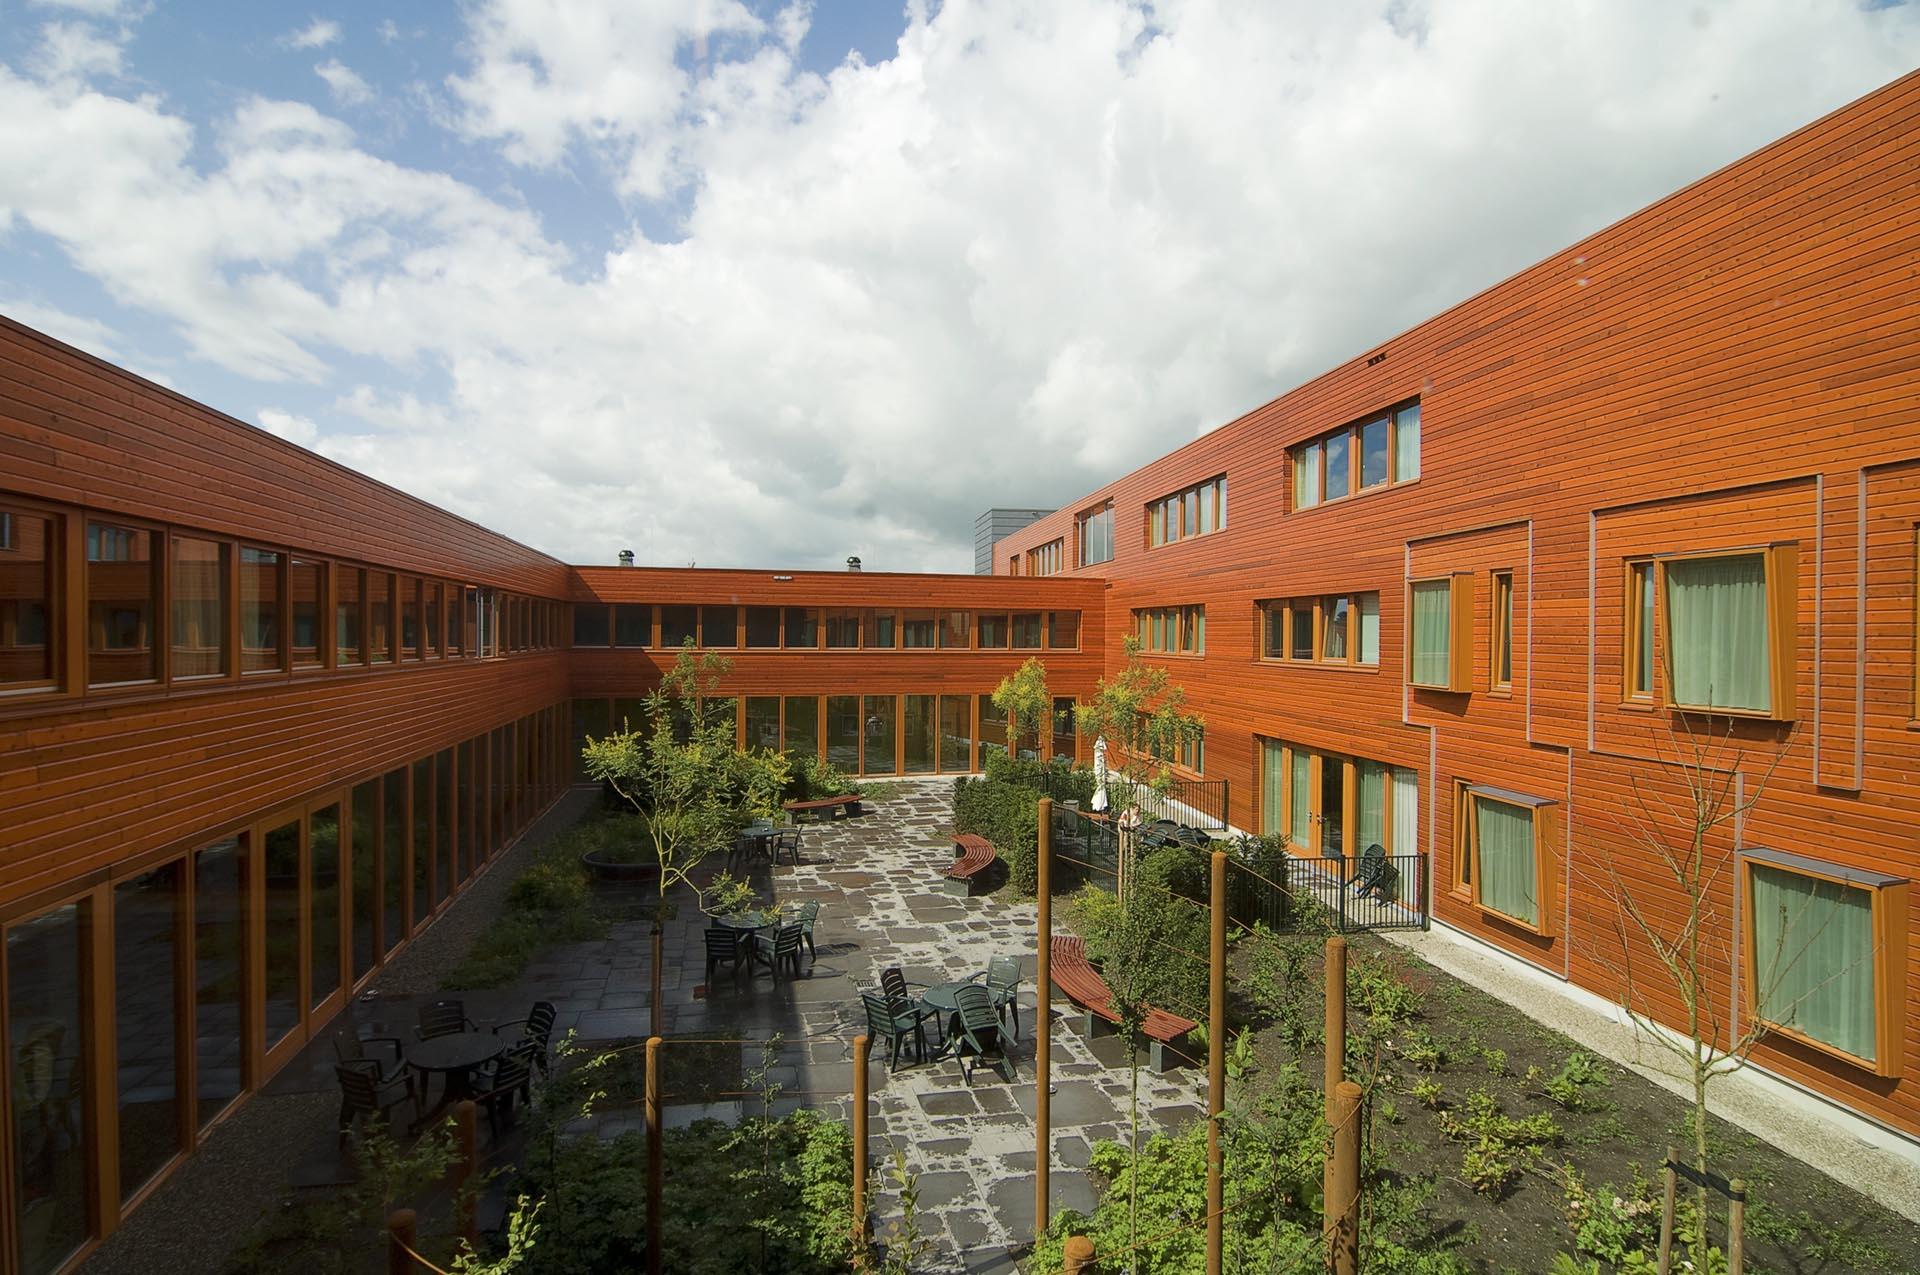 Dimence Stadshagen - RAU